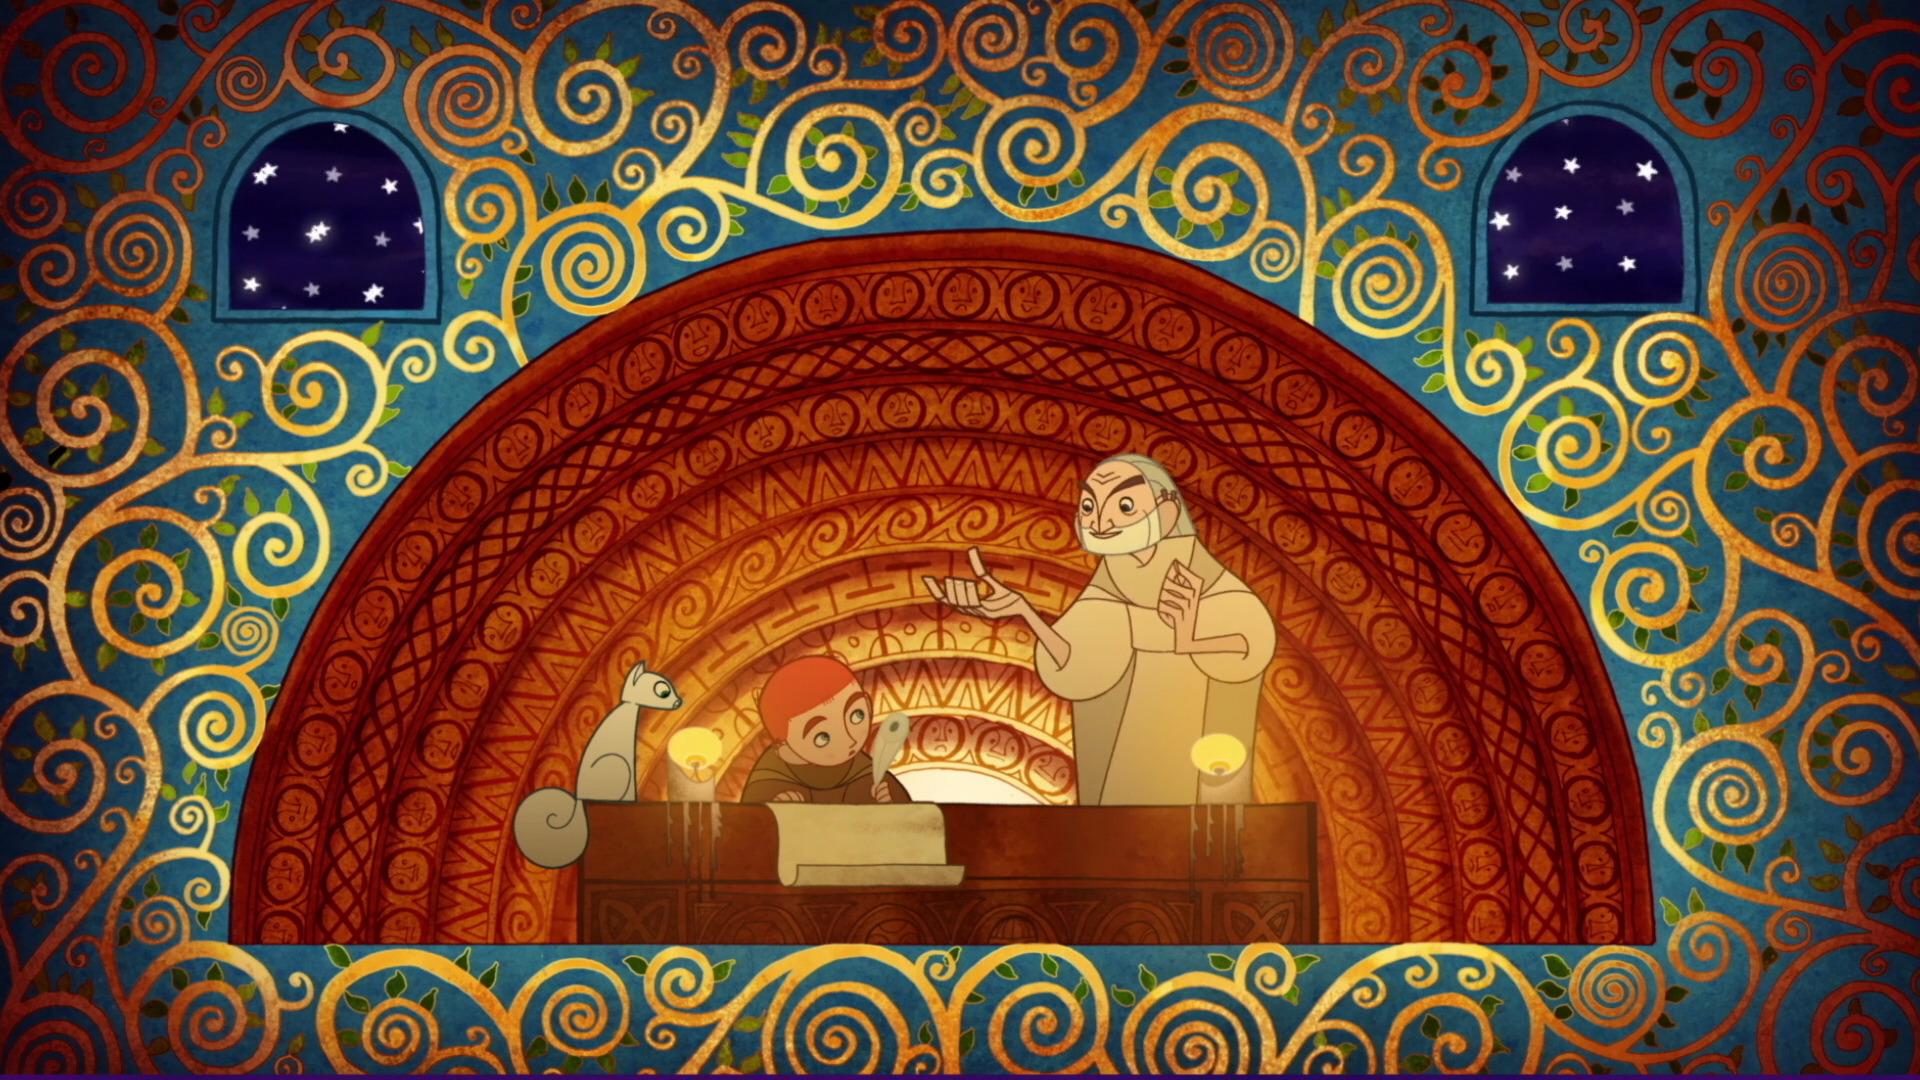 The Begorrathon The Secret Of Kells 2009 Film Grimoire